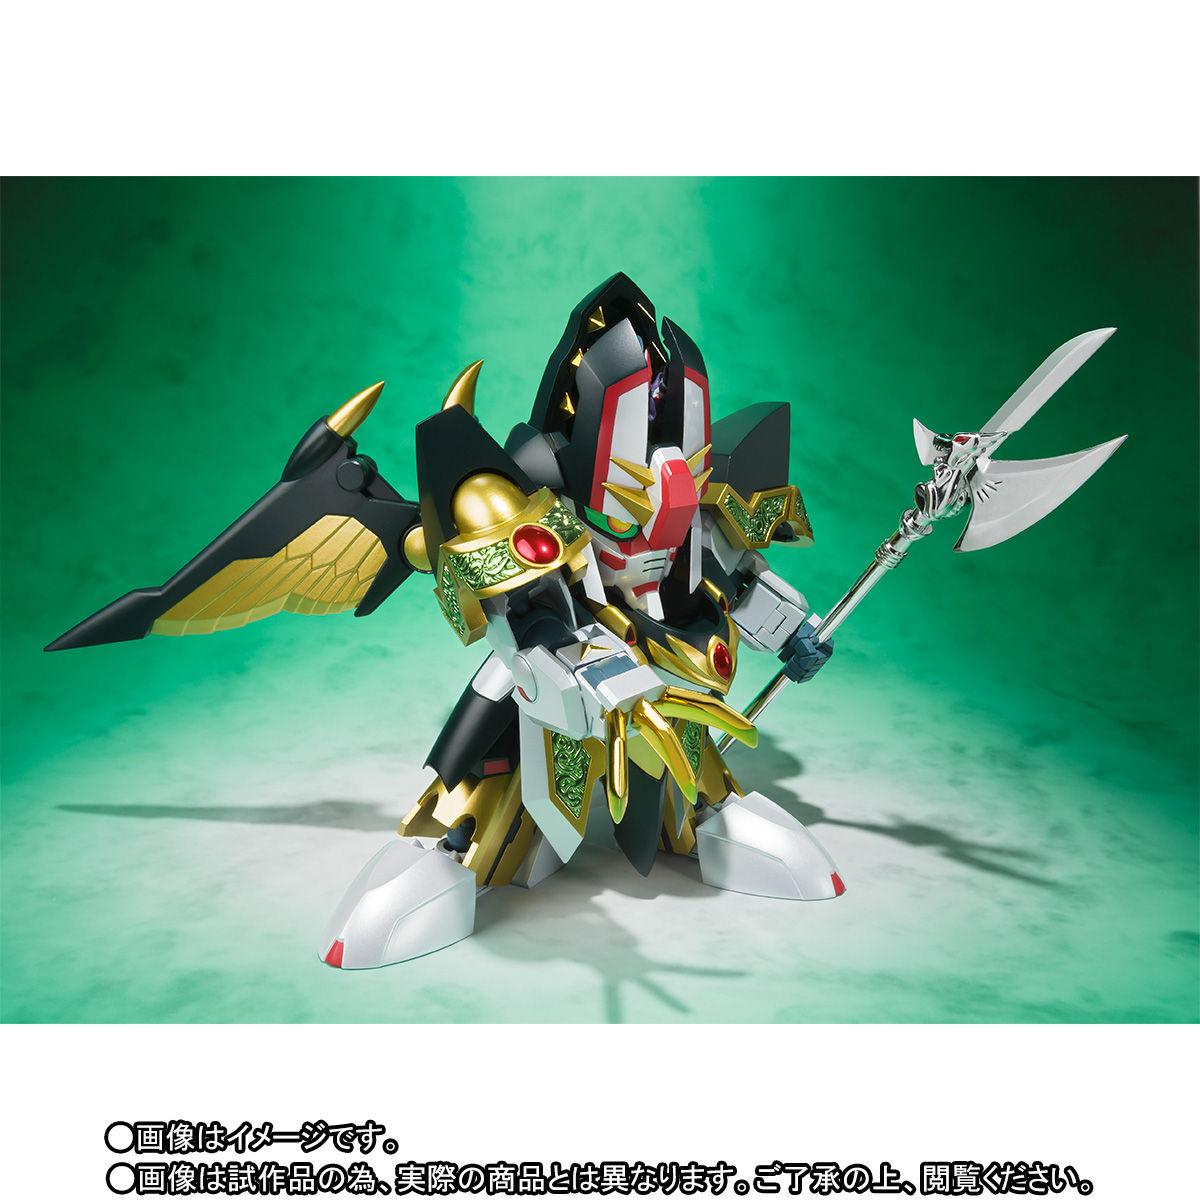 SDX『龍機ドラグーン 新SDガンダム外伝』可変可動フィギュア-004